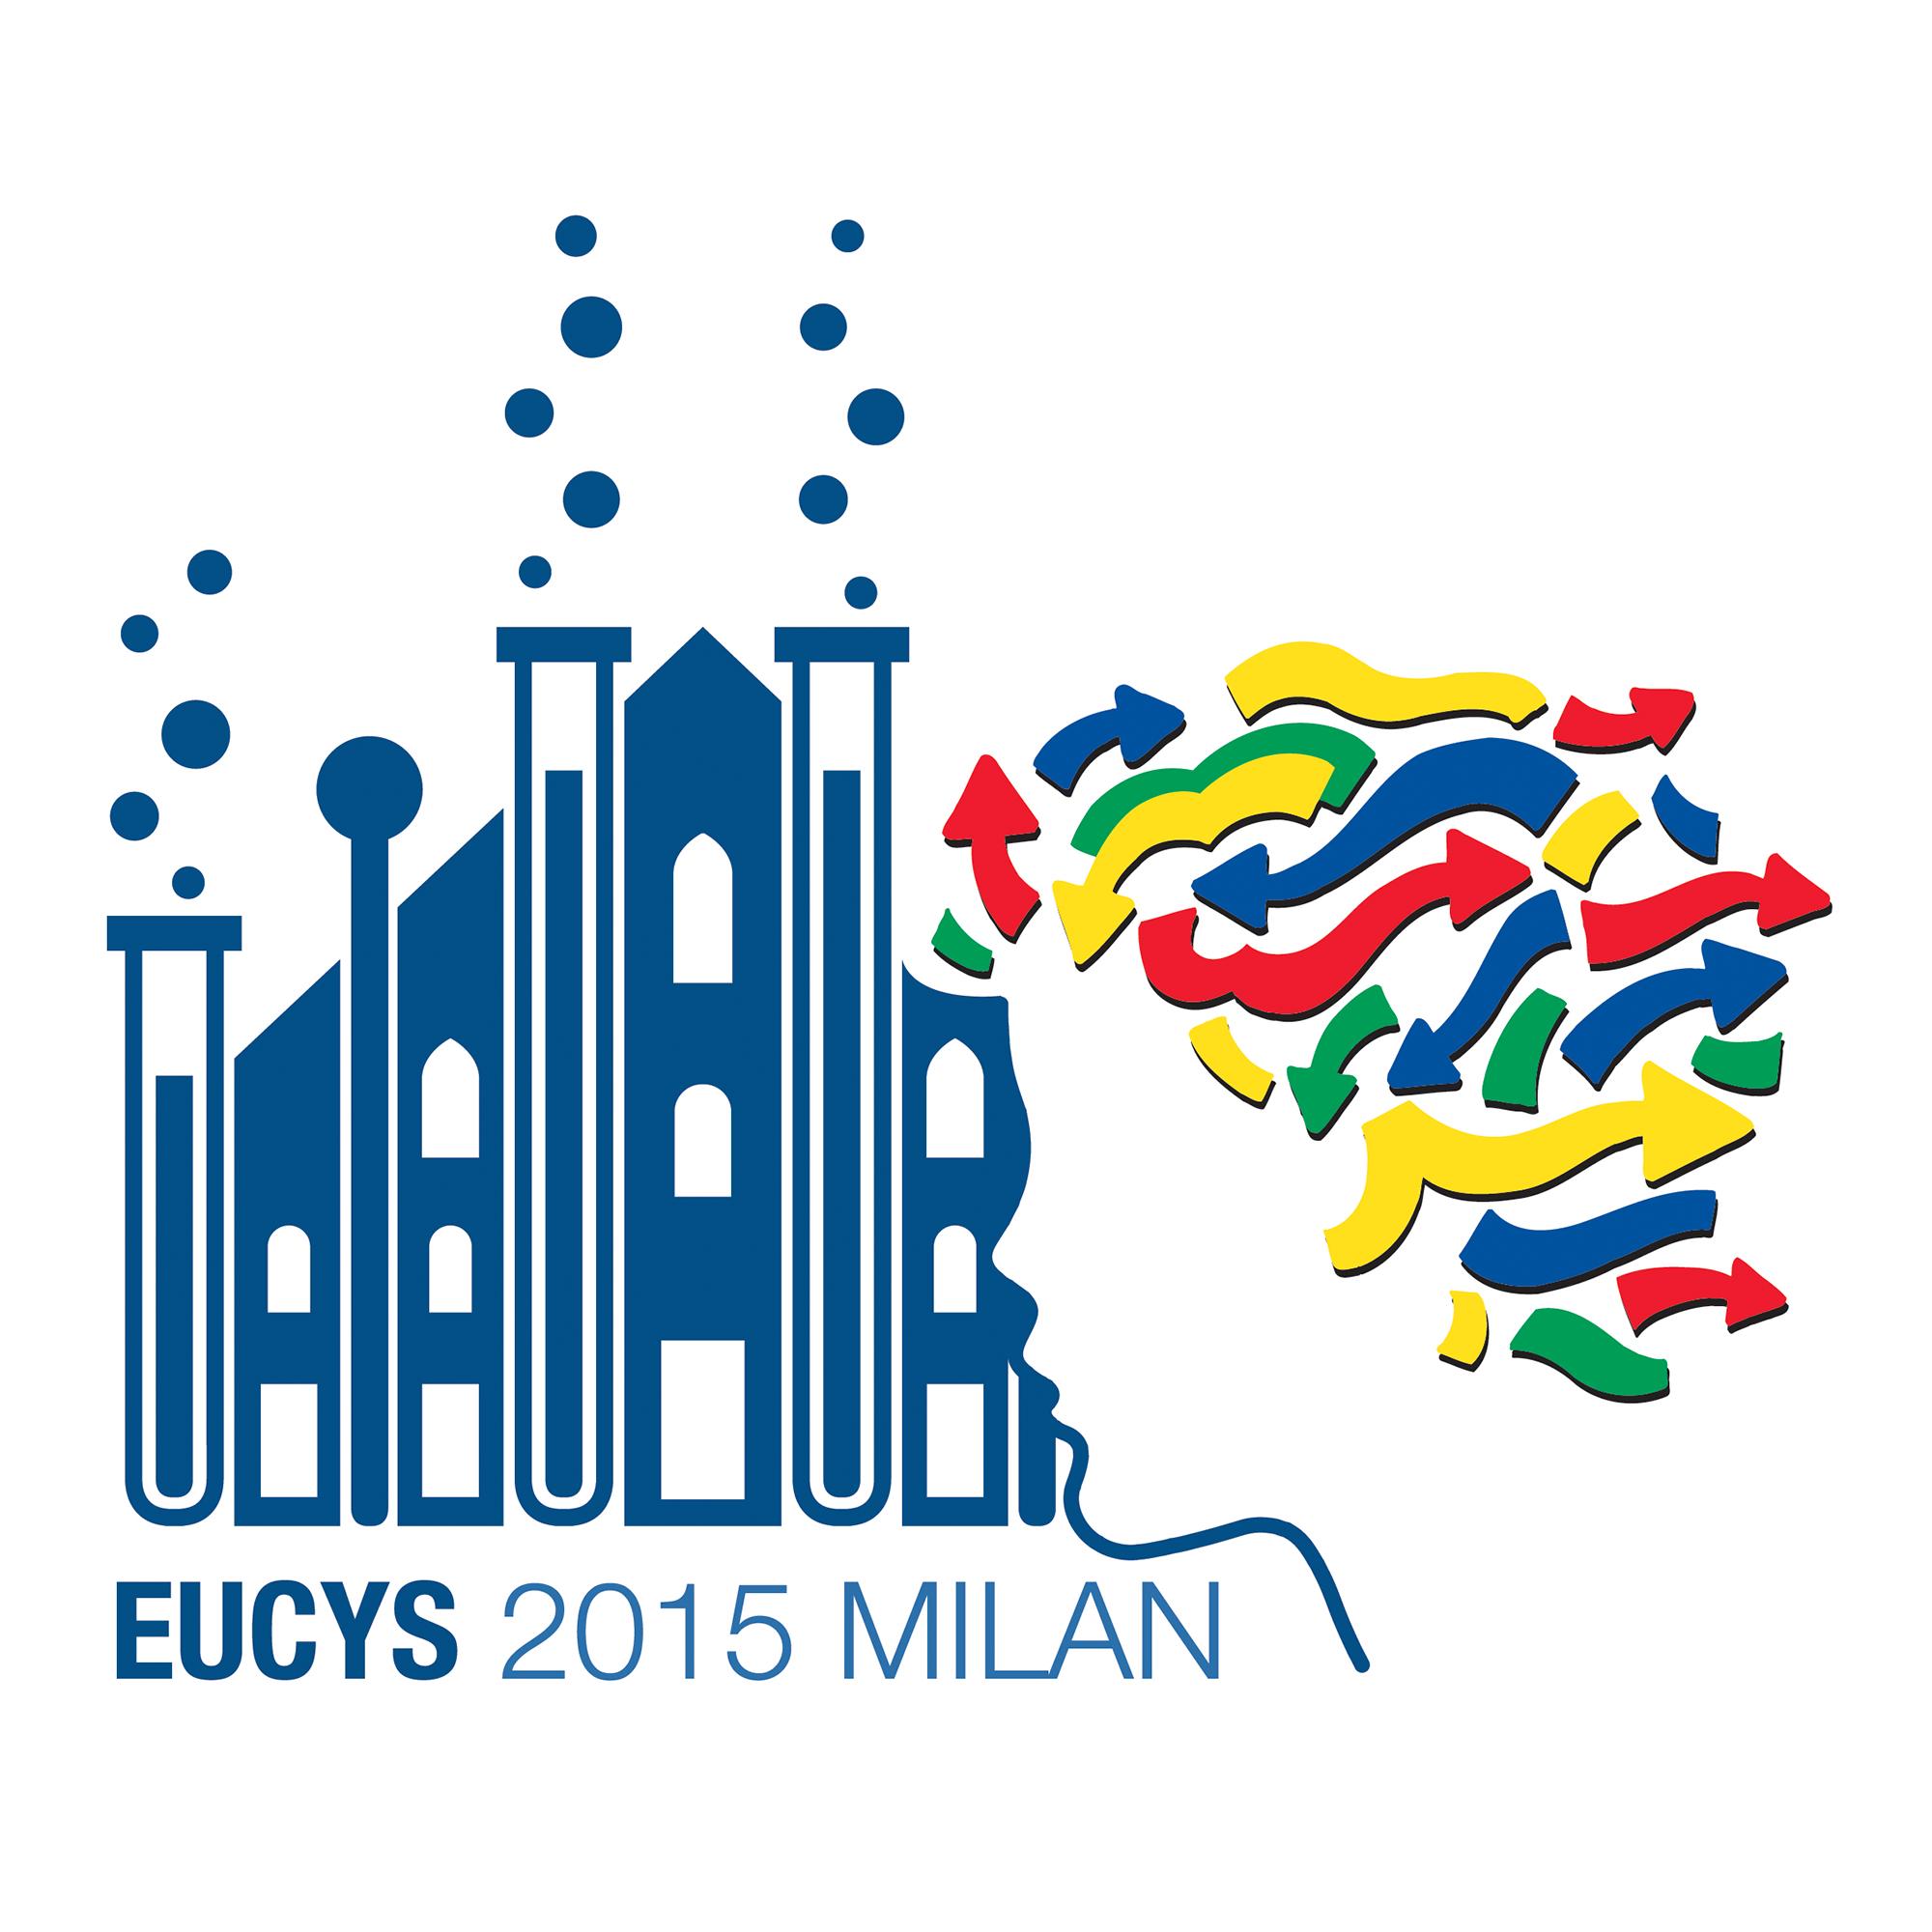 EUCYS 2015 Milan